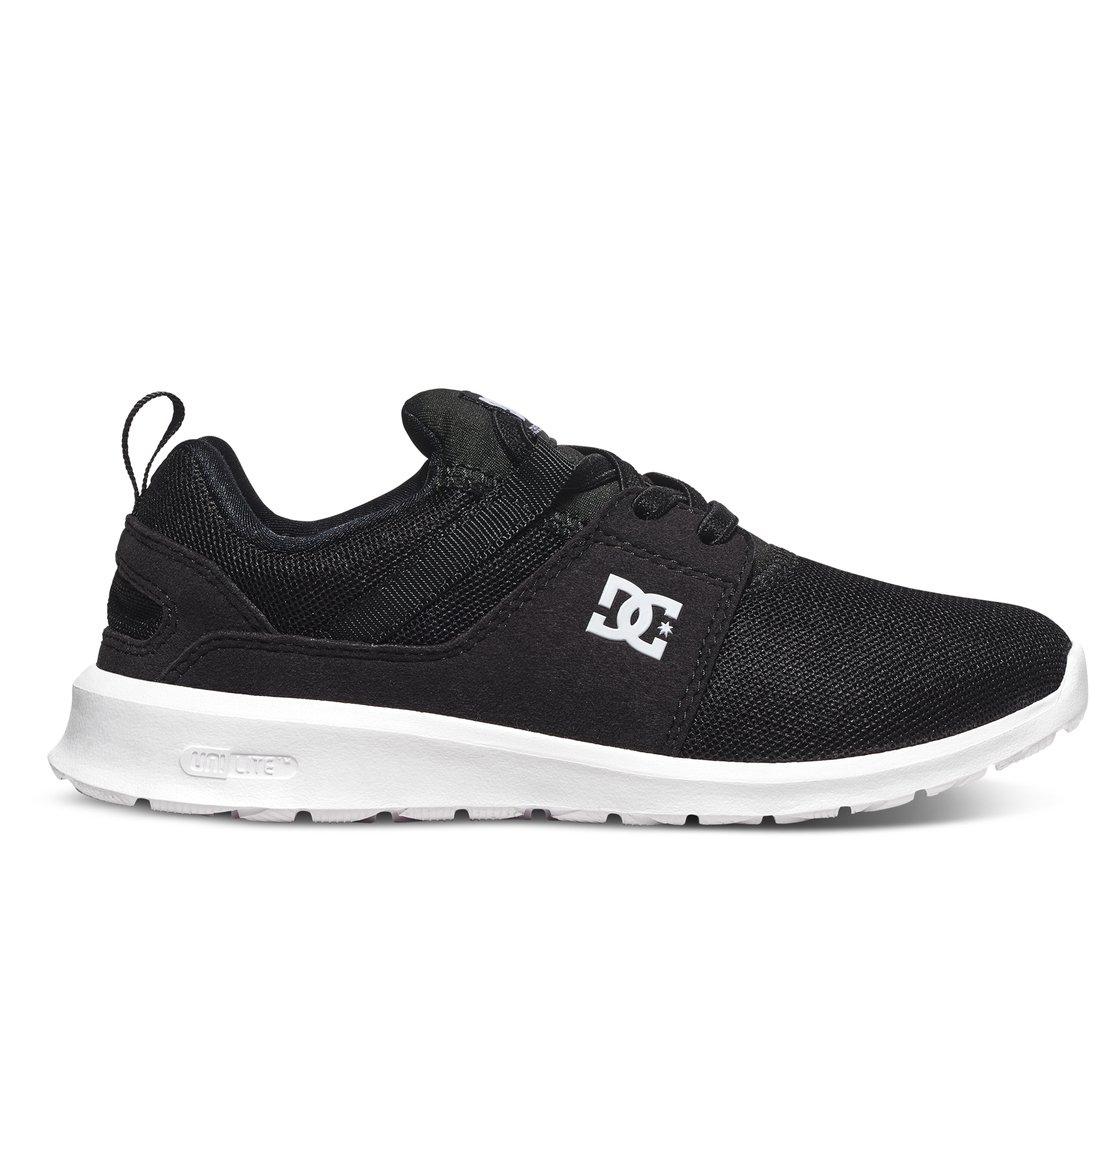 0 Heathrow - Elastic-Laced Shoes for Boys Black ADBS700047 DC Shoes fc2104b1713fb